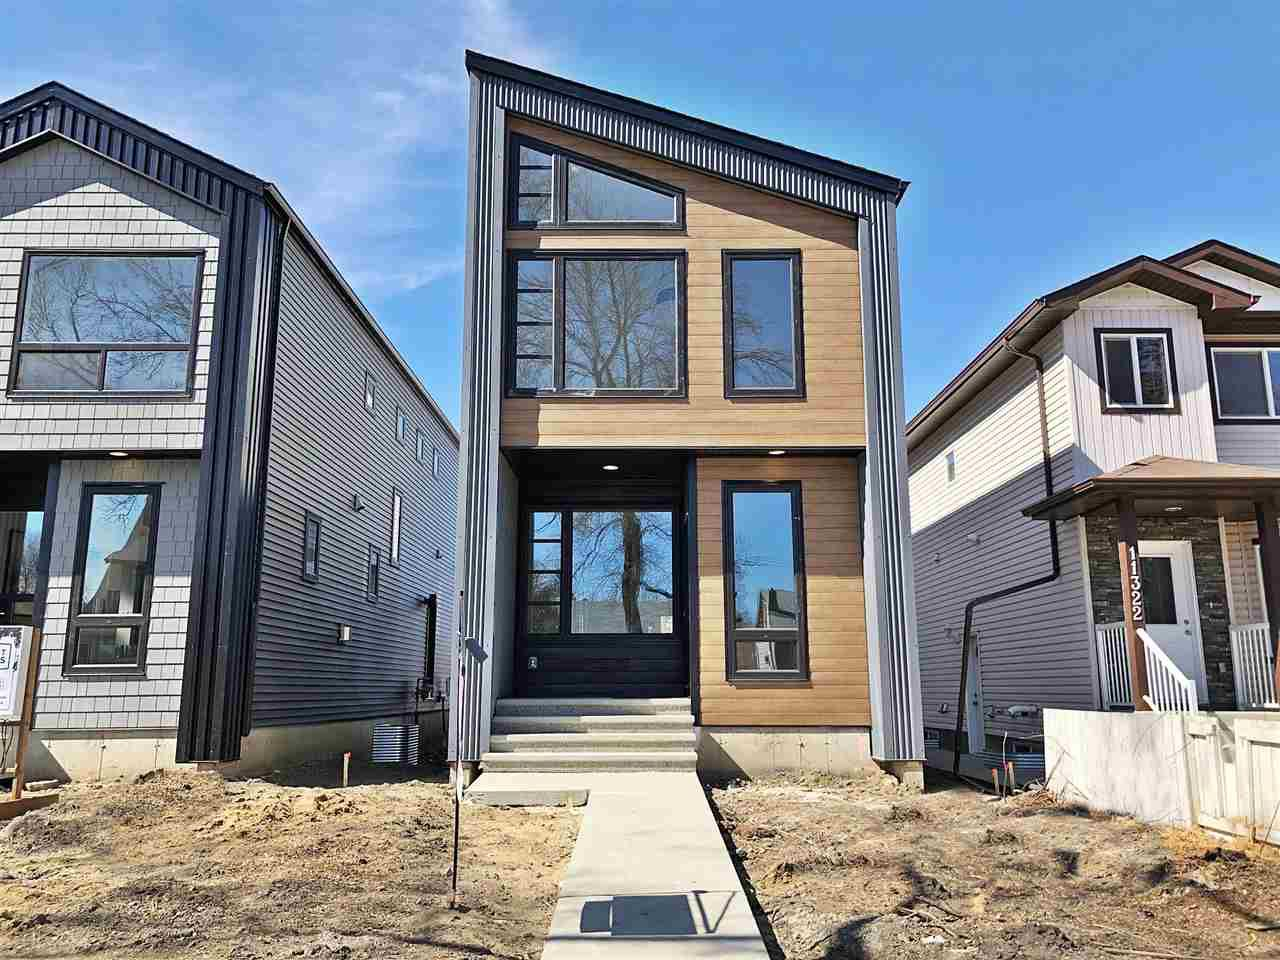 Main Photo: 11320 127 Street in Edmonton: Zone 07 House for sale : MLS®# E4144690